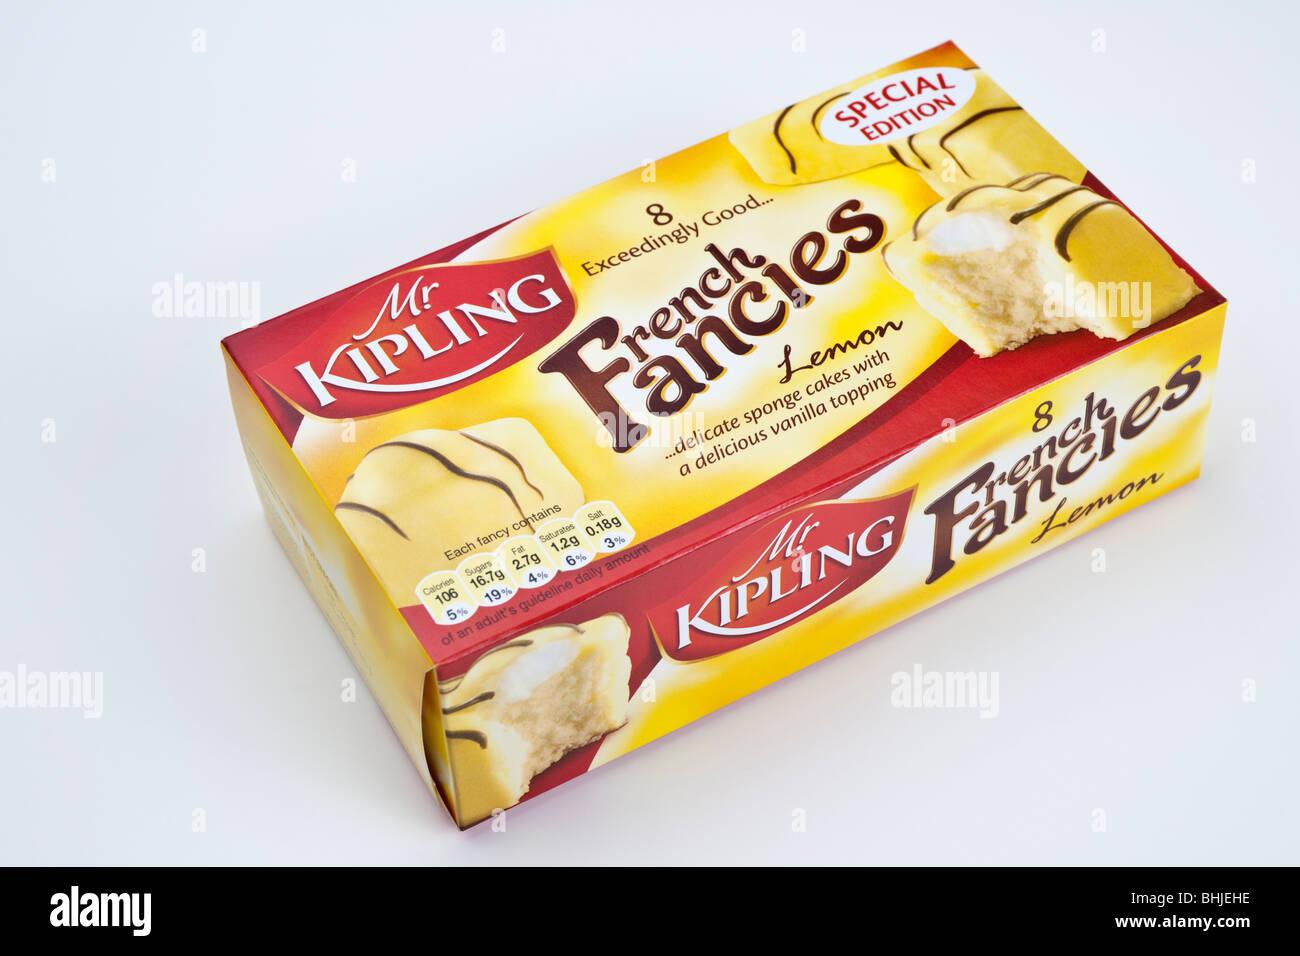 Sponge Cakes Ltd